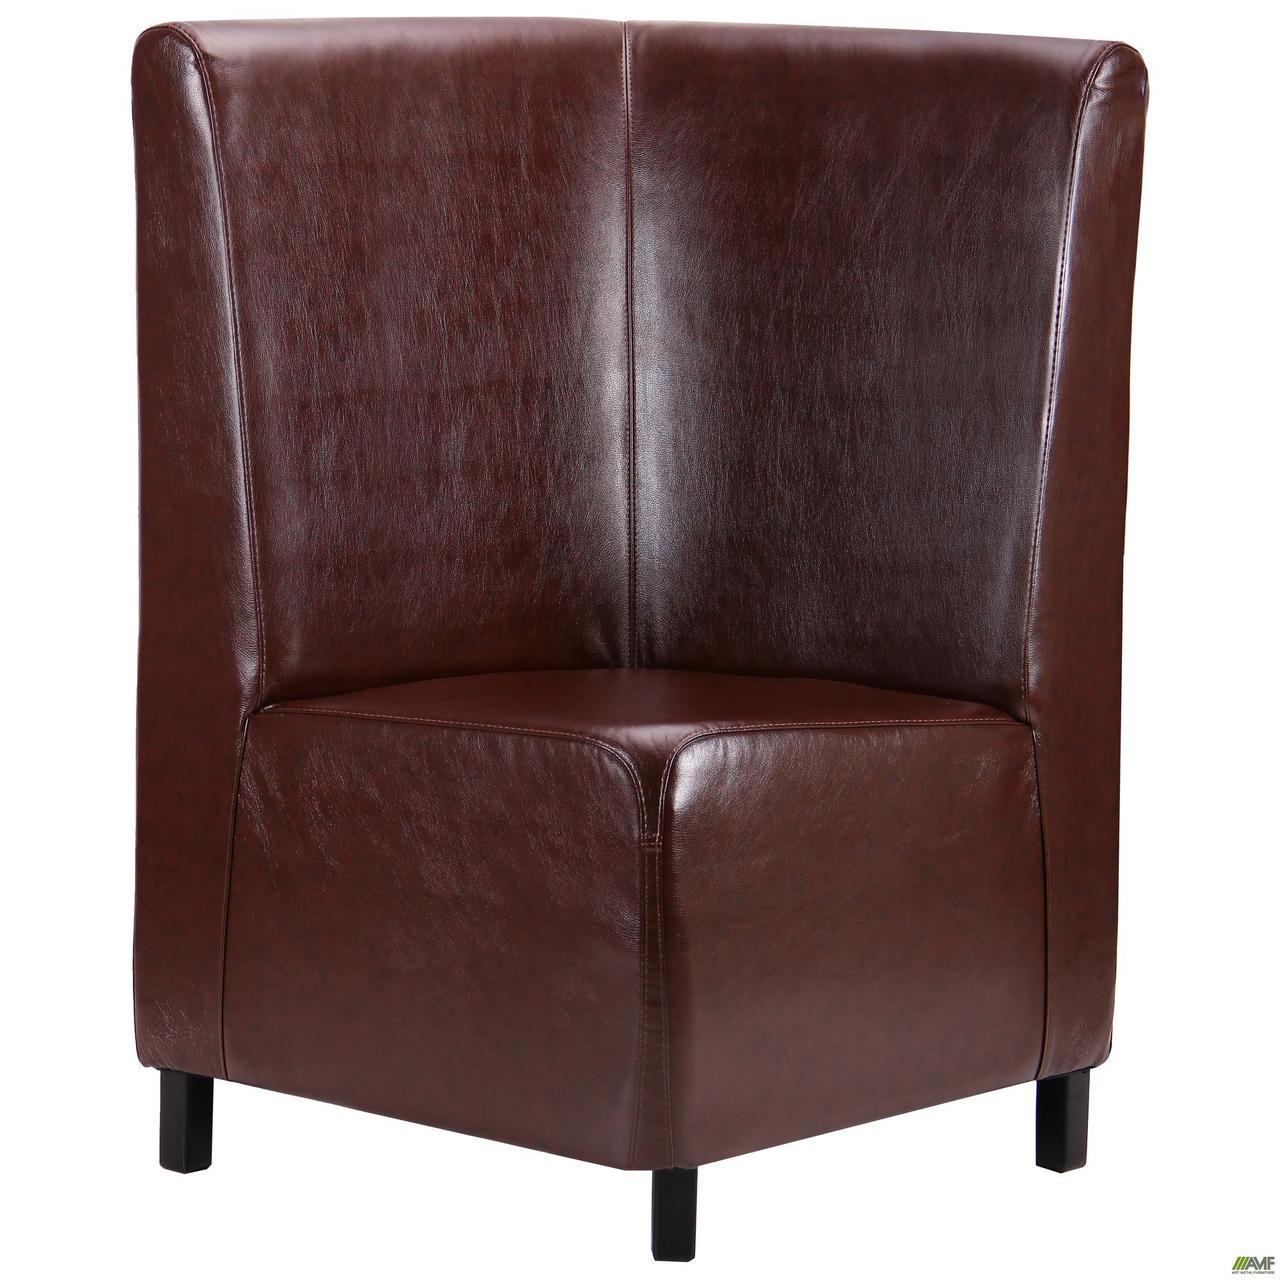 Диван Хит угловой на ножках (Н100), венге, 670*670*1100Н Мадрас дк браун ТМ АМФ